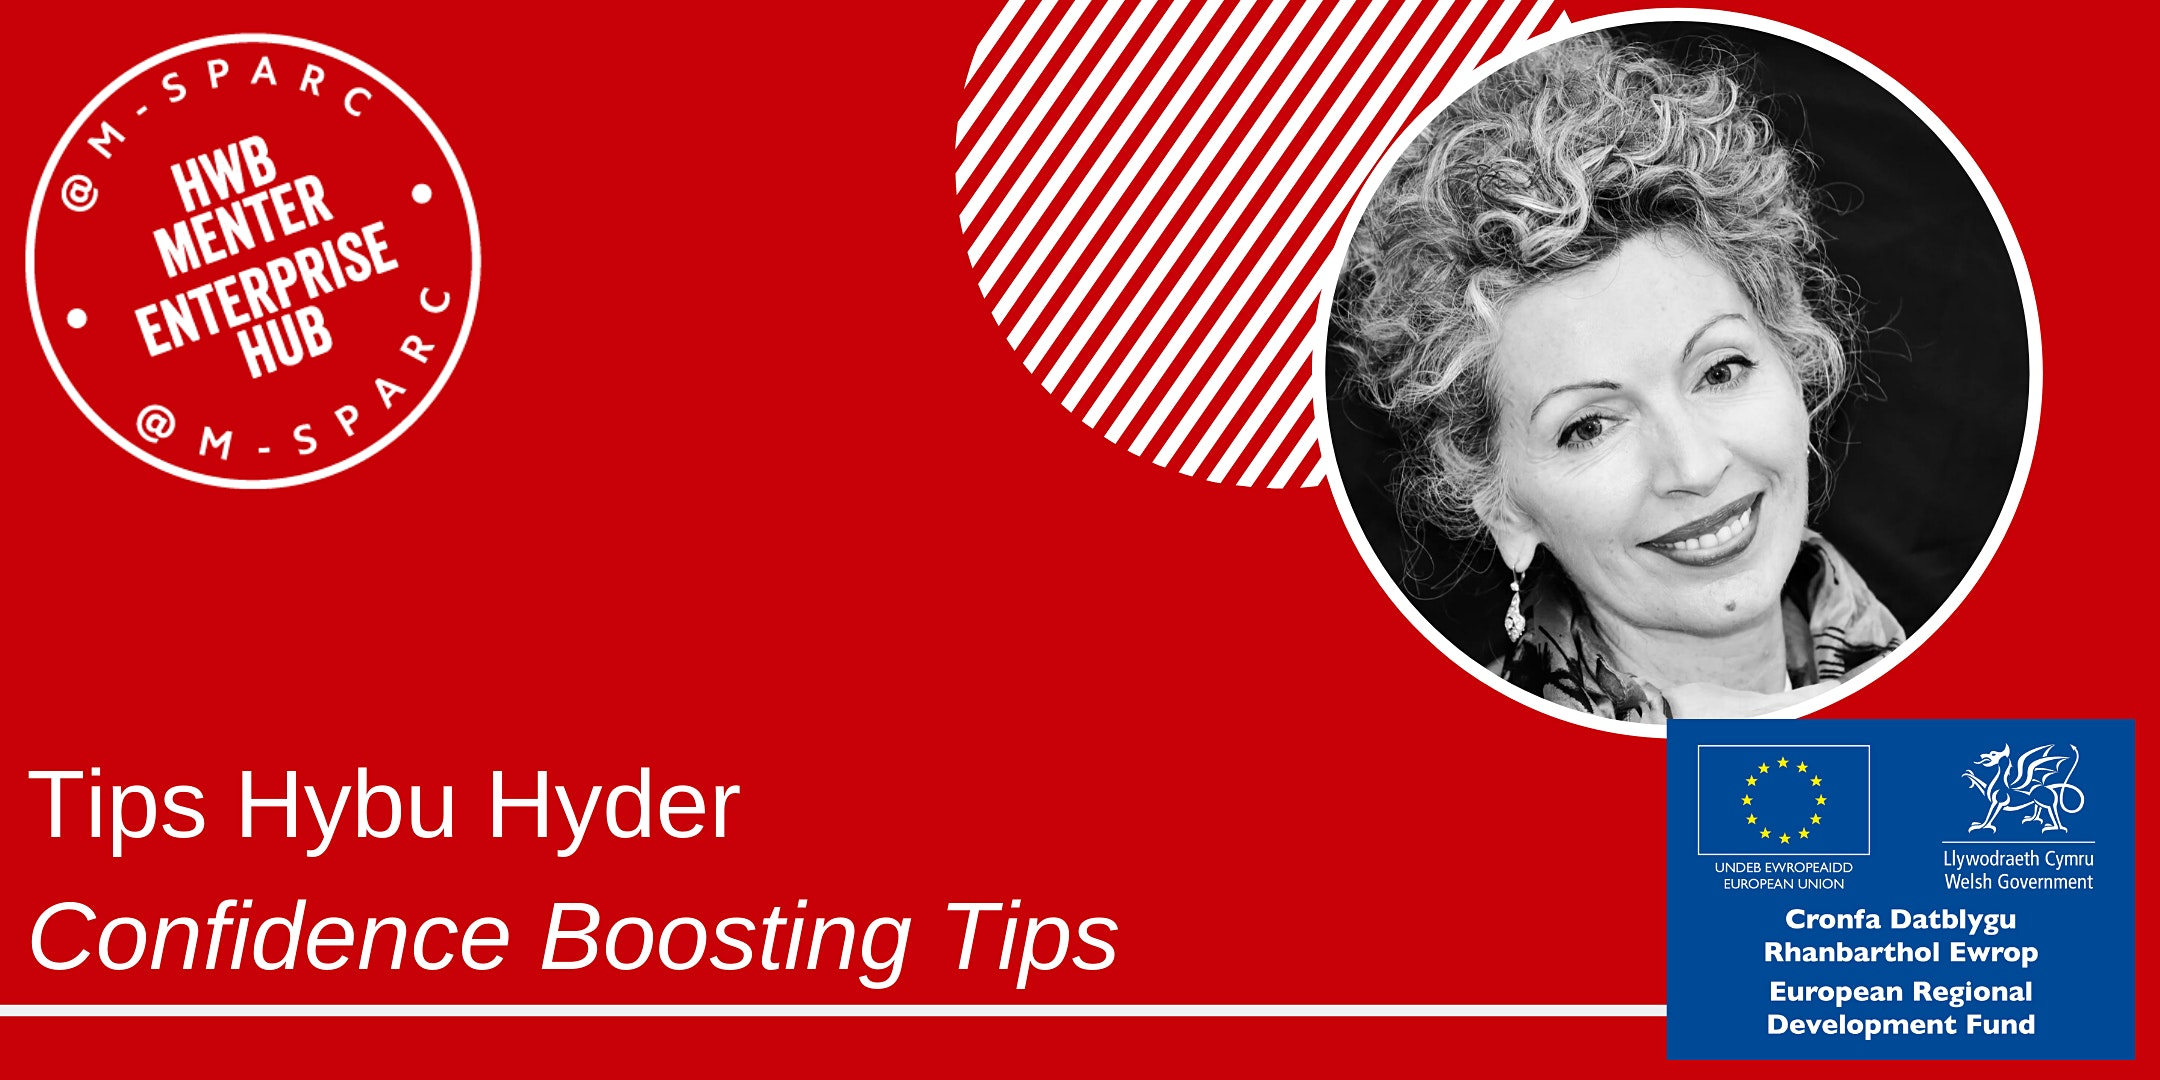 Tips Hybu Hyder / Confidence Boosting Tips